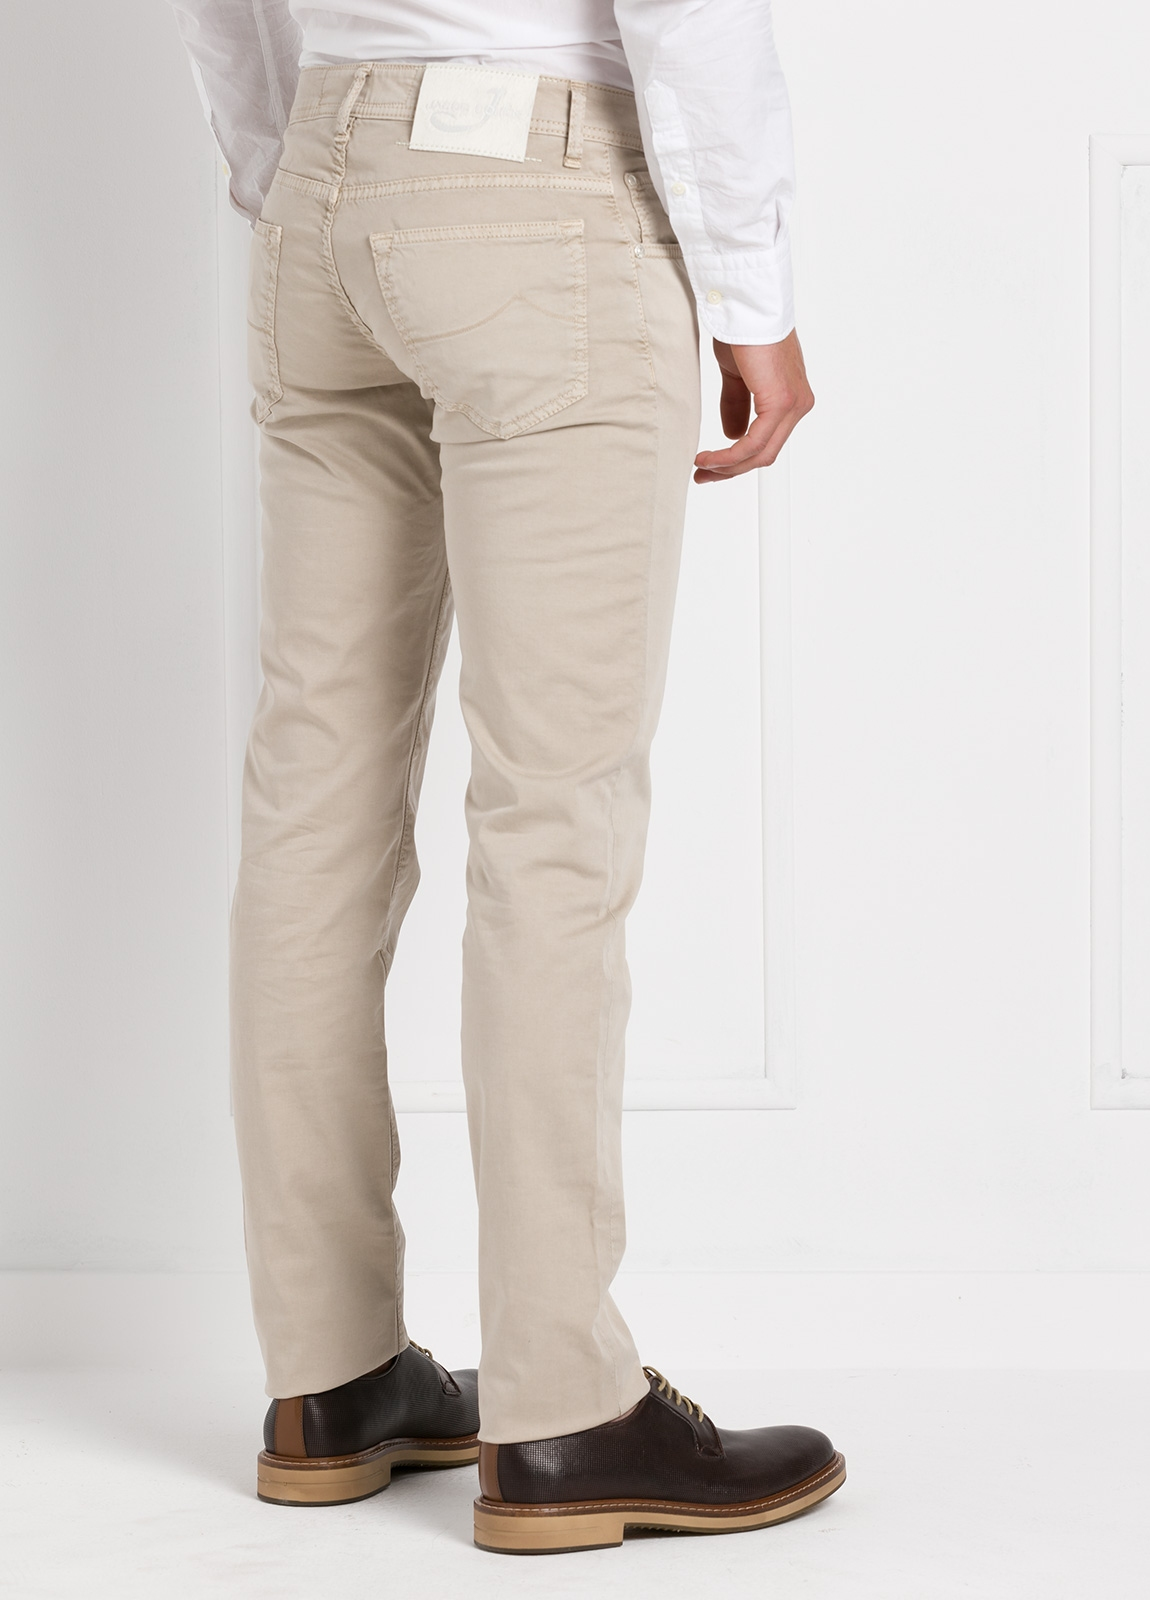 Pantalón cinco bolsillos modelo PW622 color beige. Algodón gabardina vintage. Algodón satén vintage. - Ítem2